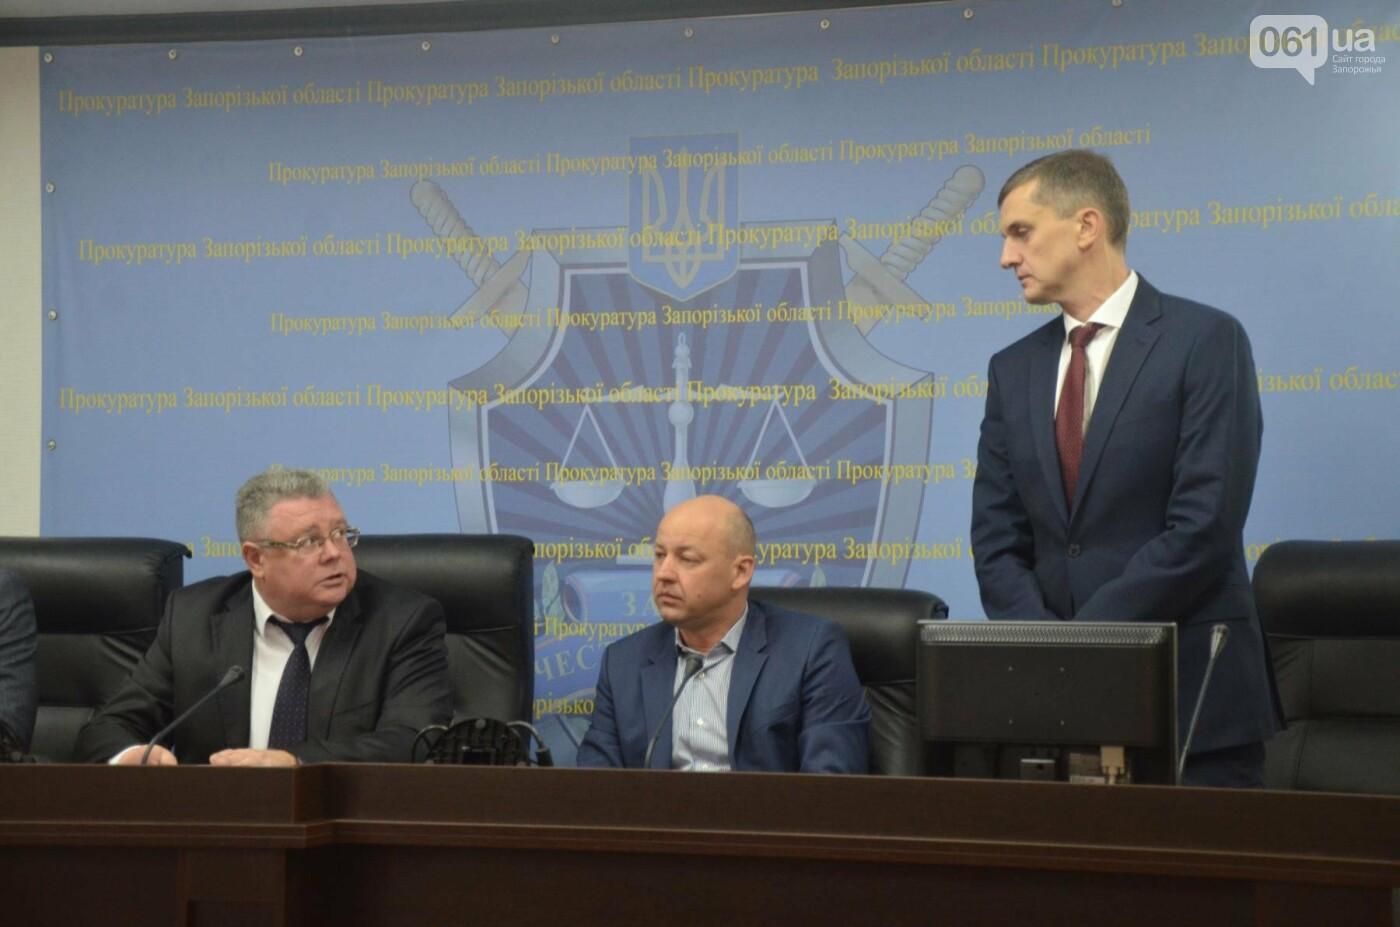 Местную прокуратуру №3 в Запорожье возглавил экс-прокурор Кривого Рога, - ФОТО , фото-1